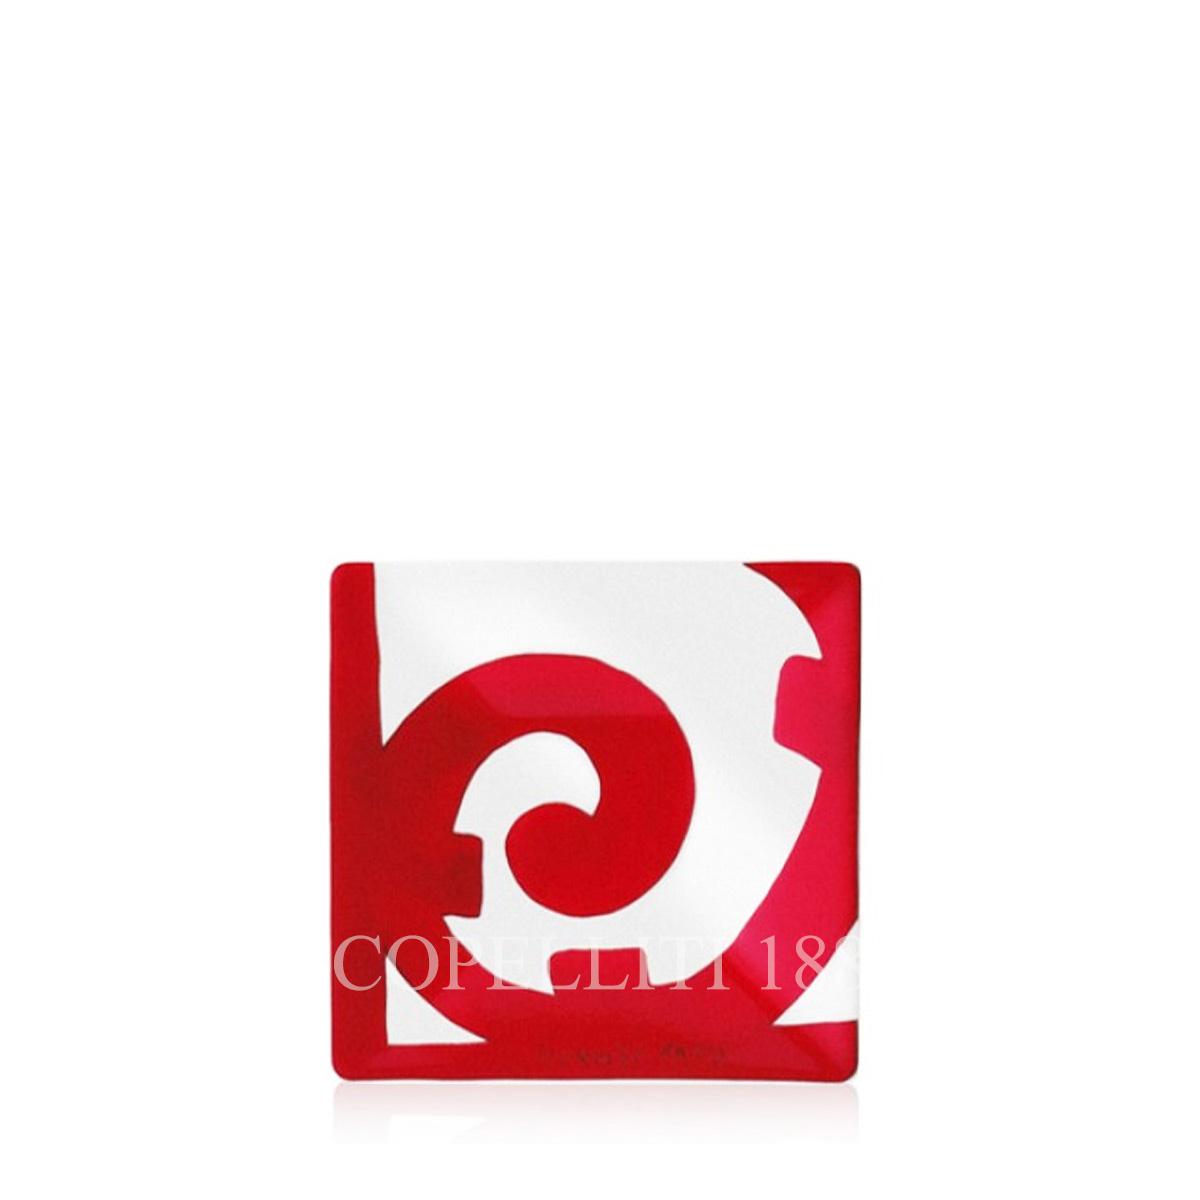 bomboniera hermes piattino rosso bianco elegante